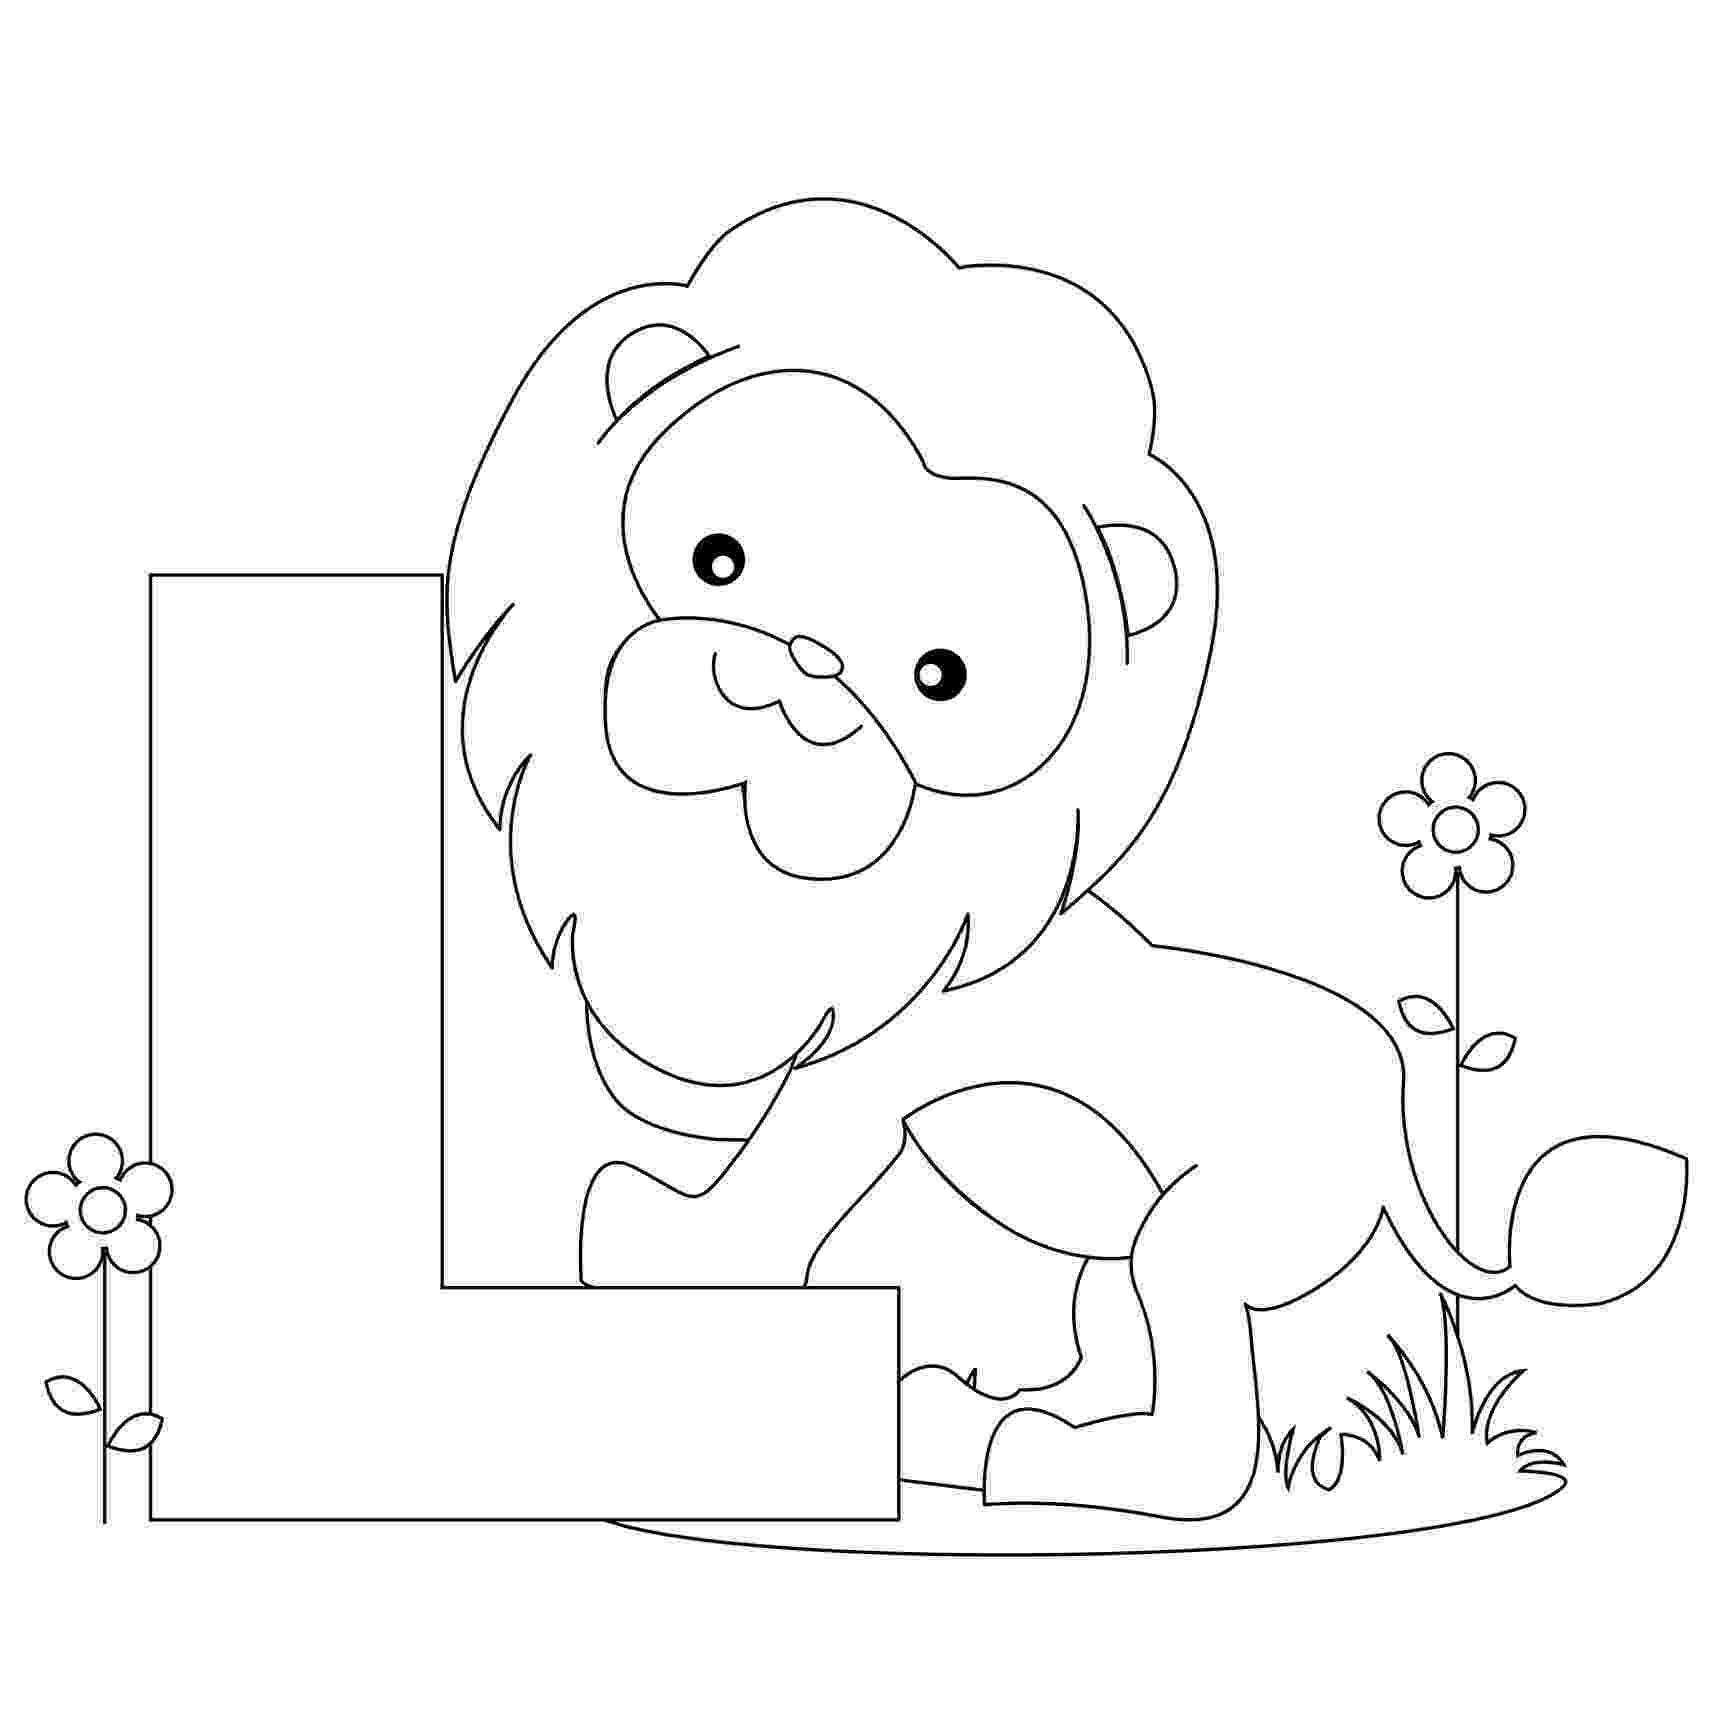 coloring book alphabet free printable alphabet coloring pages for kids best book alphabet coloring